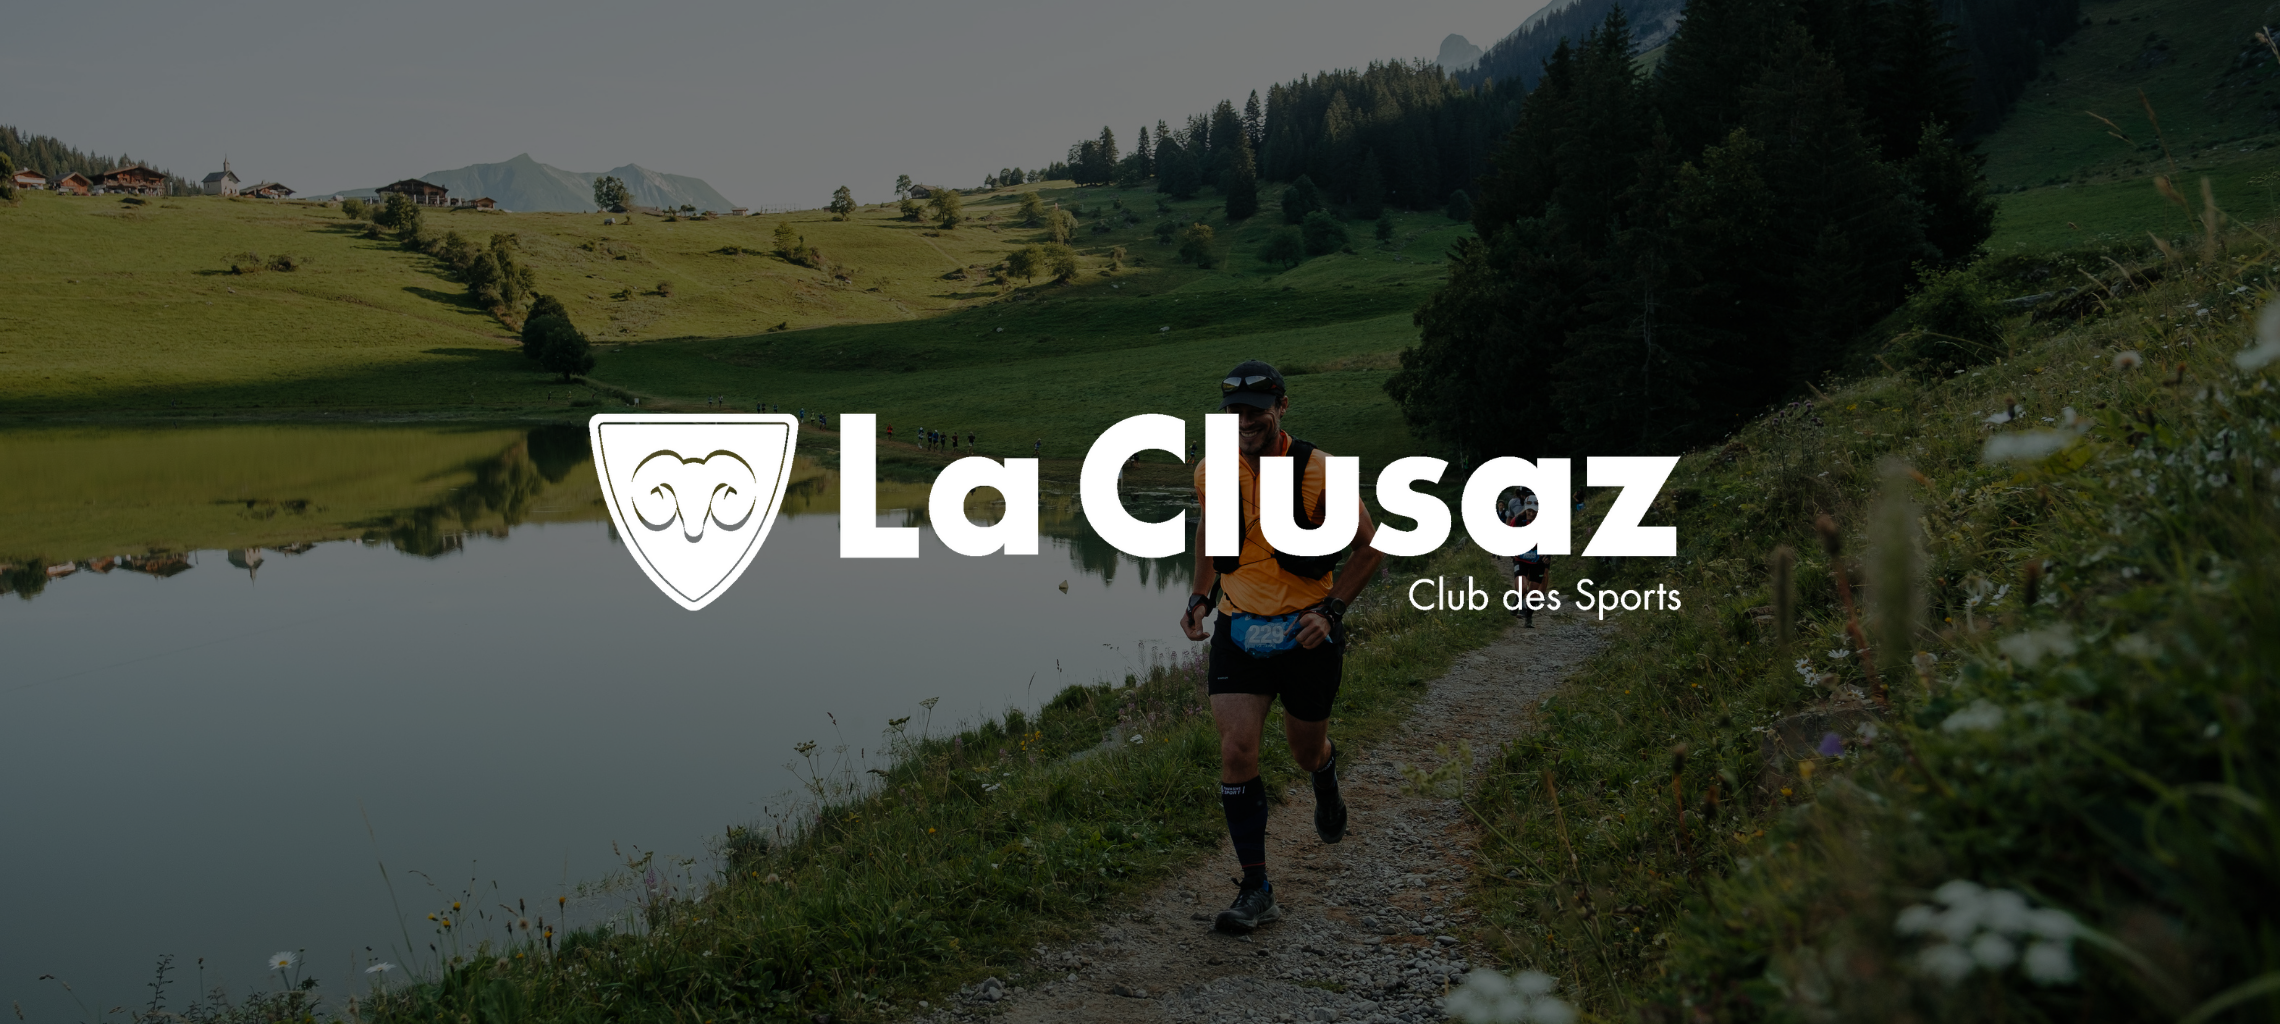 Club des Sports La Clusaz